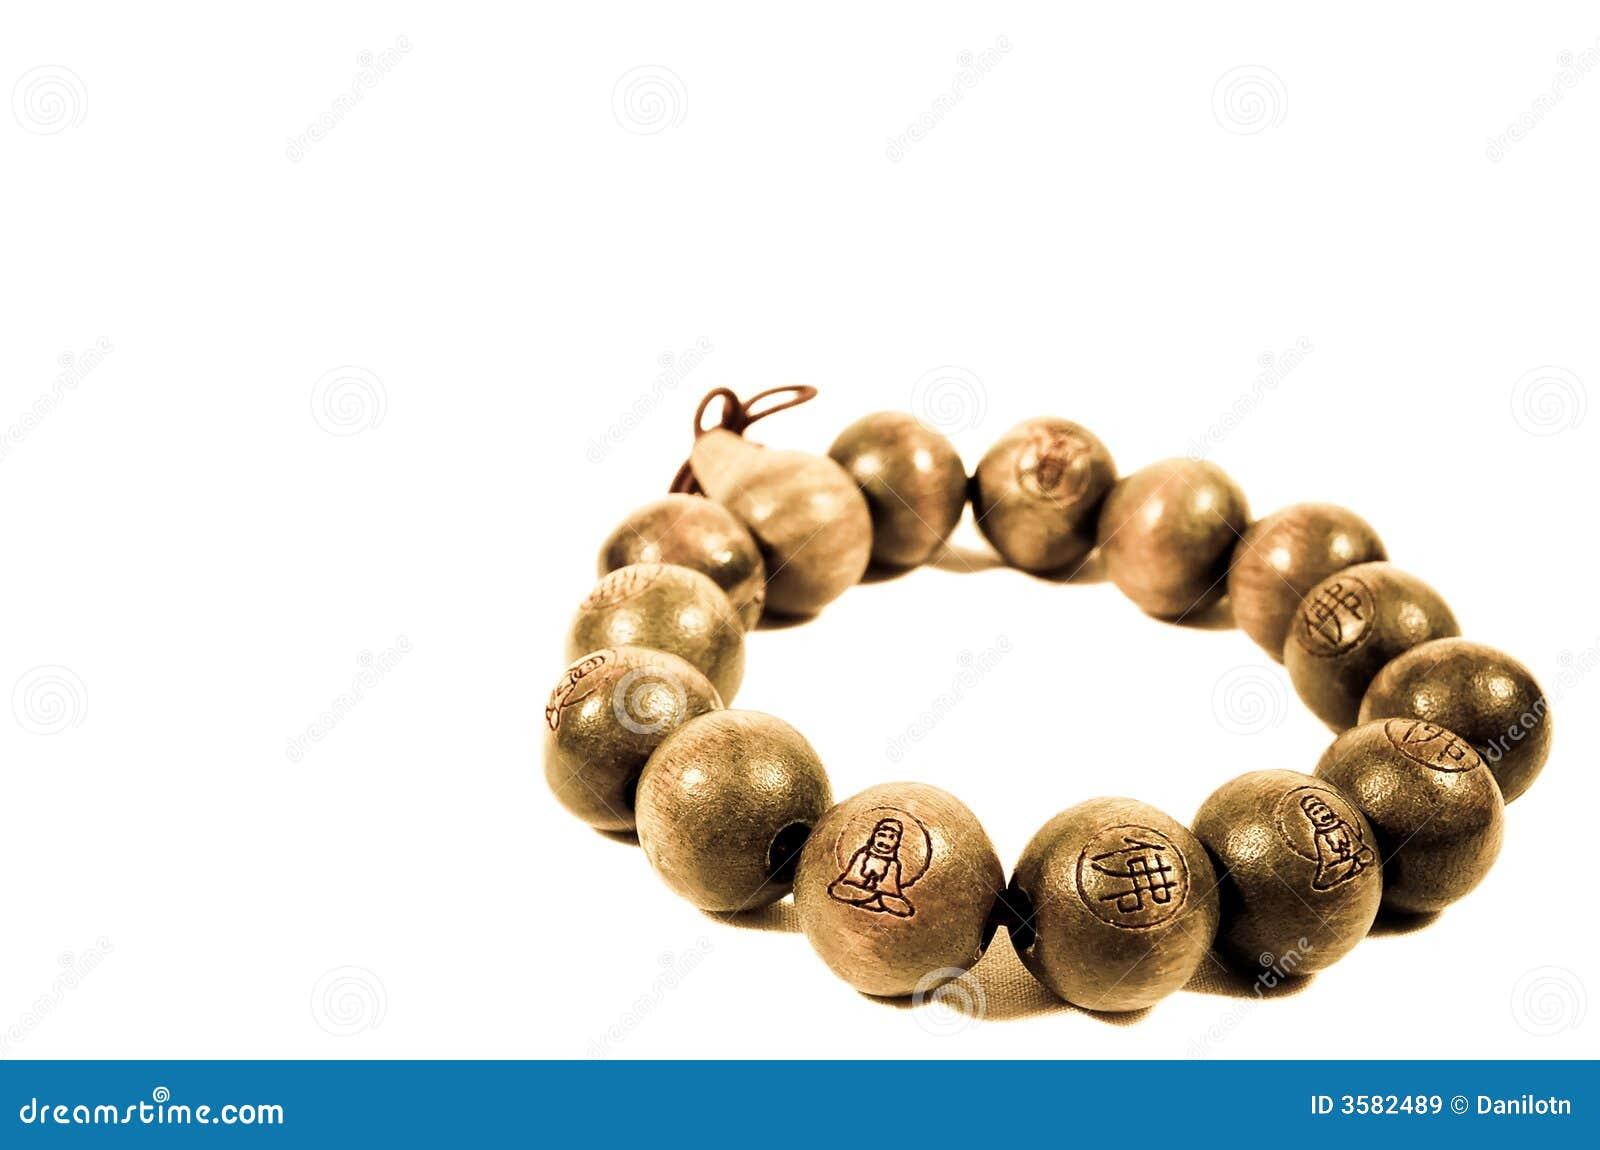 Buddhist Wooden Bead Bracelet